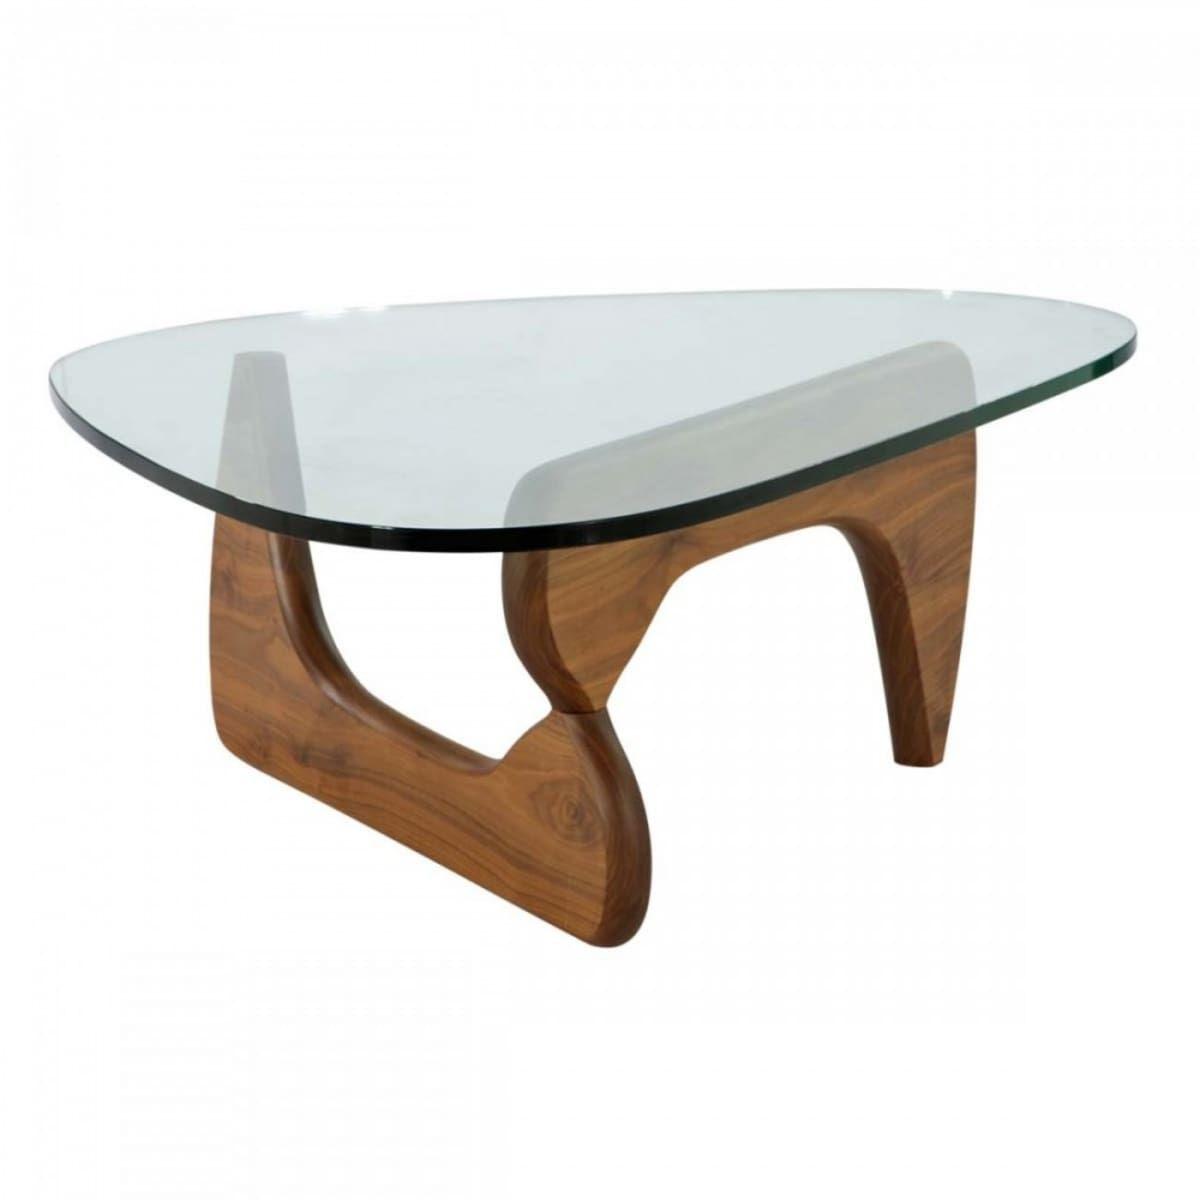 Noguchi Style Coffee Table Light Walnut 549 Free Shipping